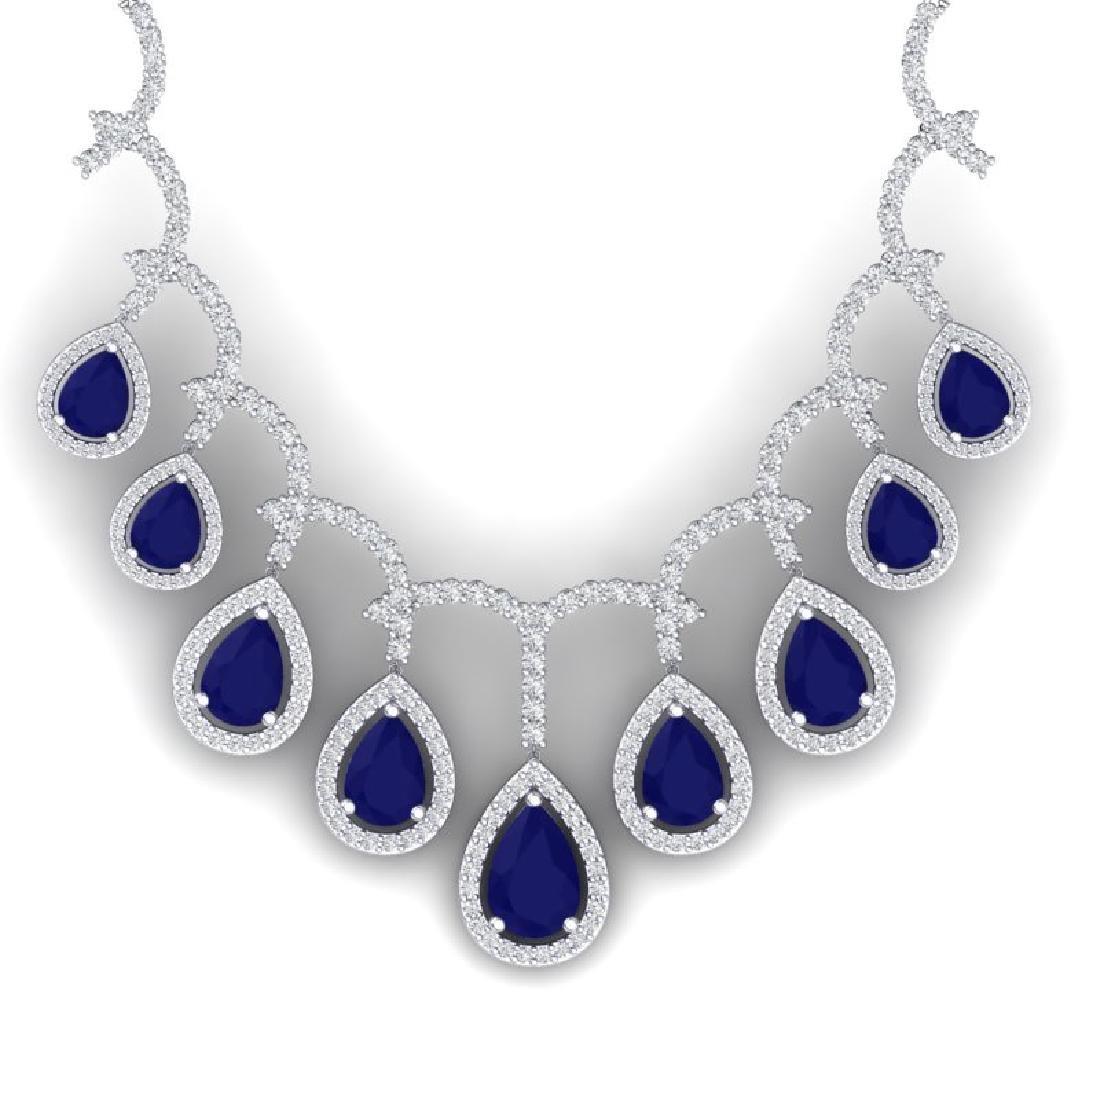 31.5 CTW Royalty Sapphire & VS Diamond Necklace 18K